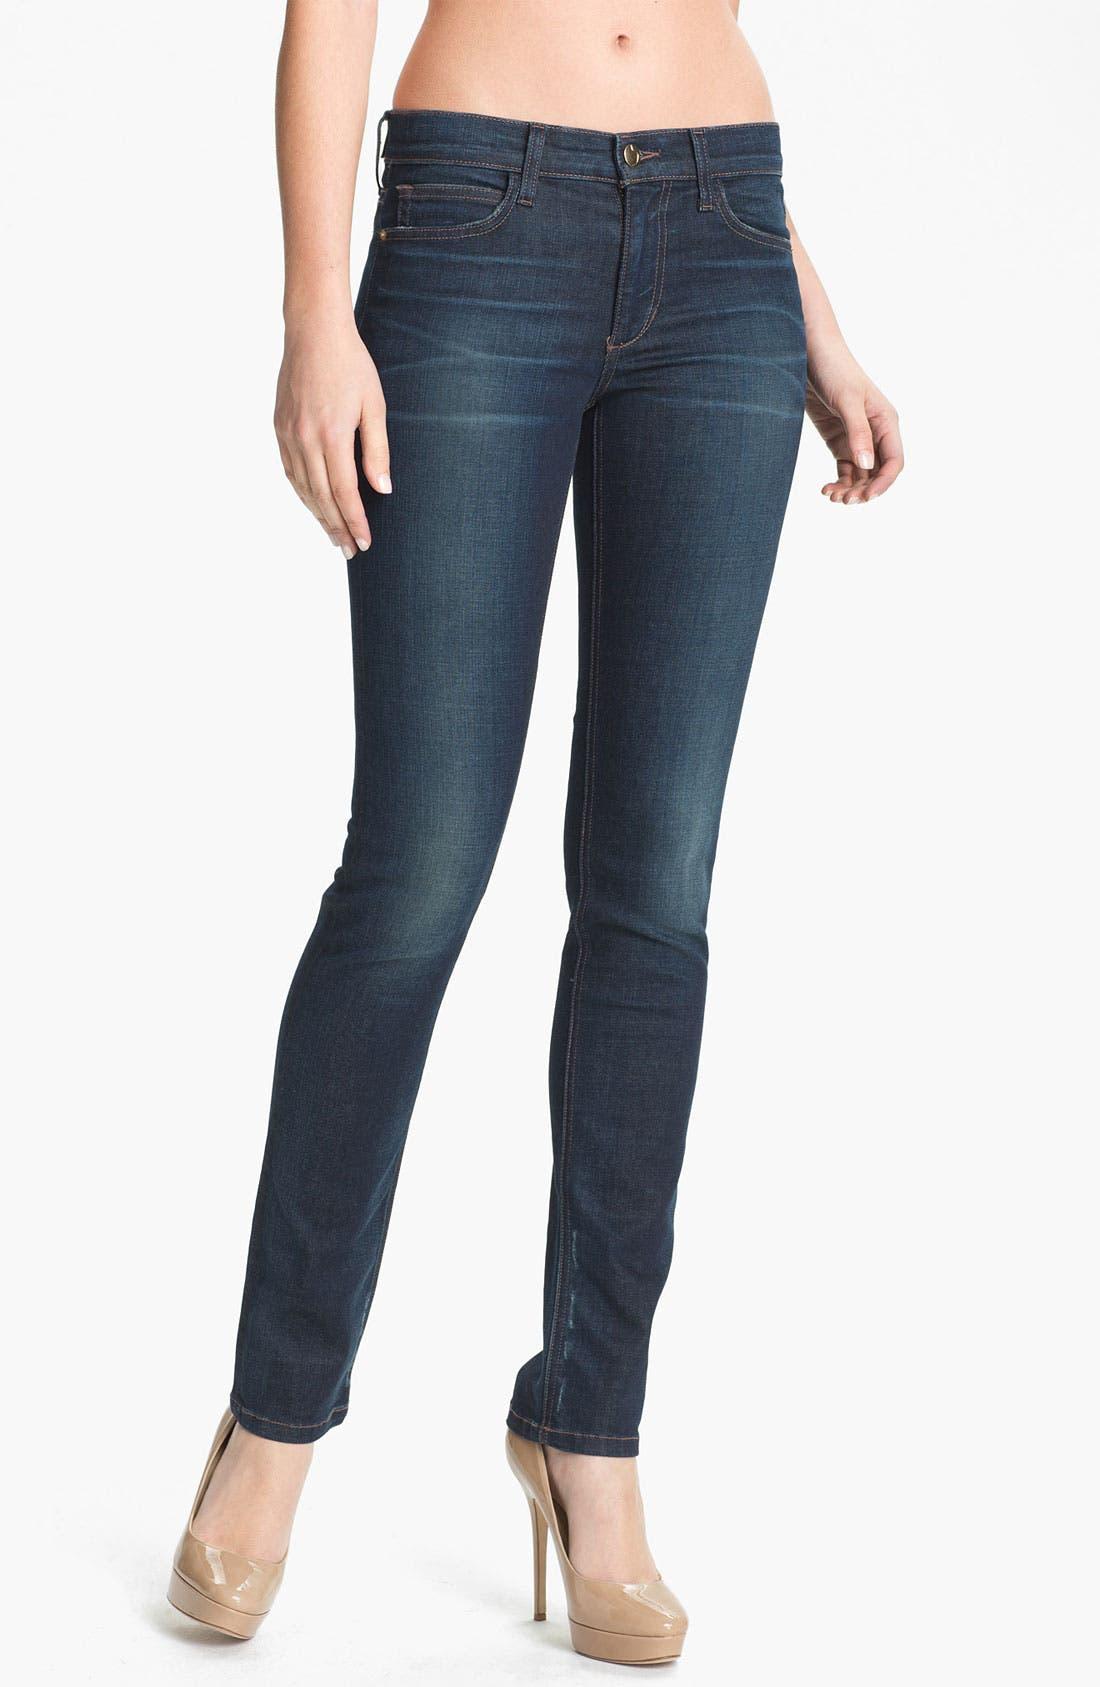 Alternate Image 1 Selected - Joe's 'Vintage Reserve' Straight Leg Jeans (Roxalana)